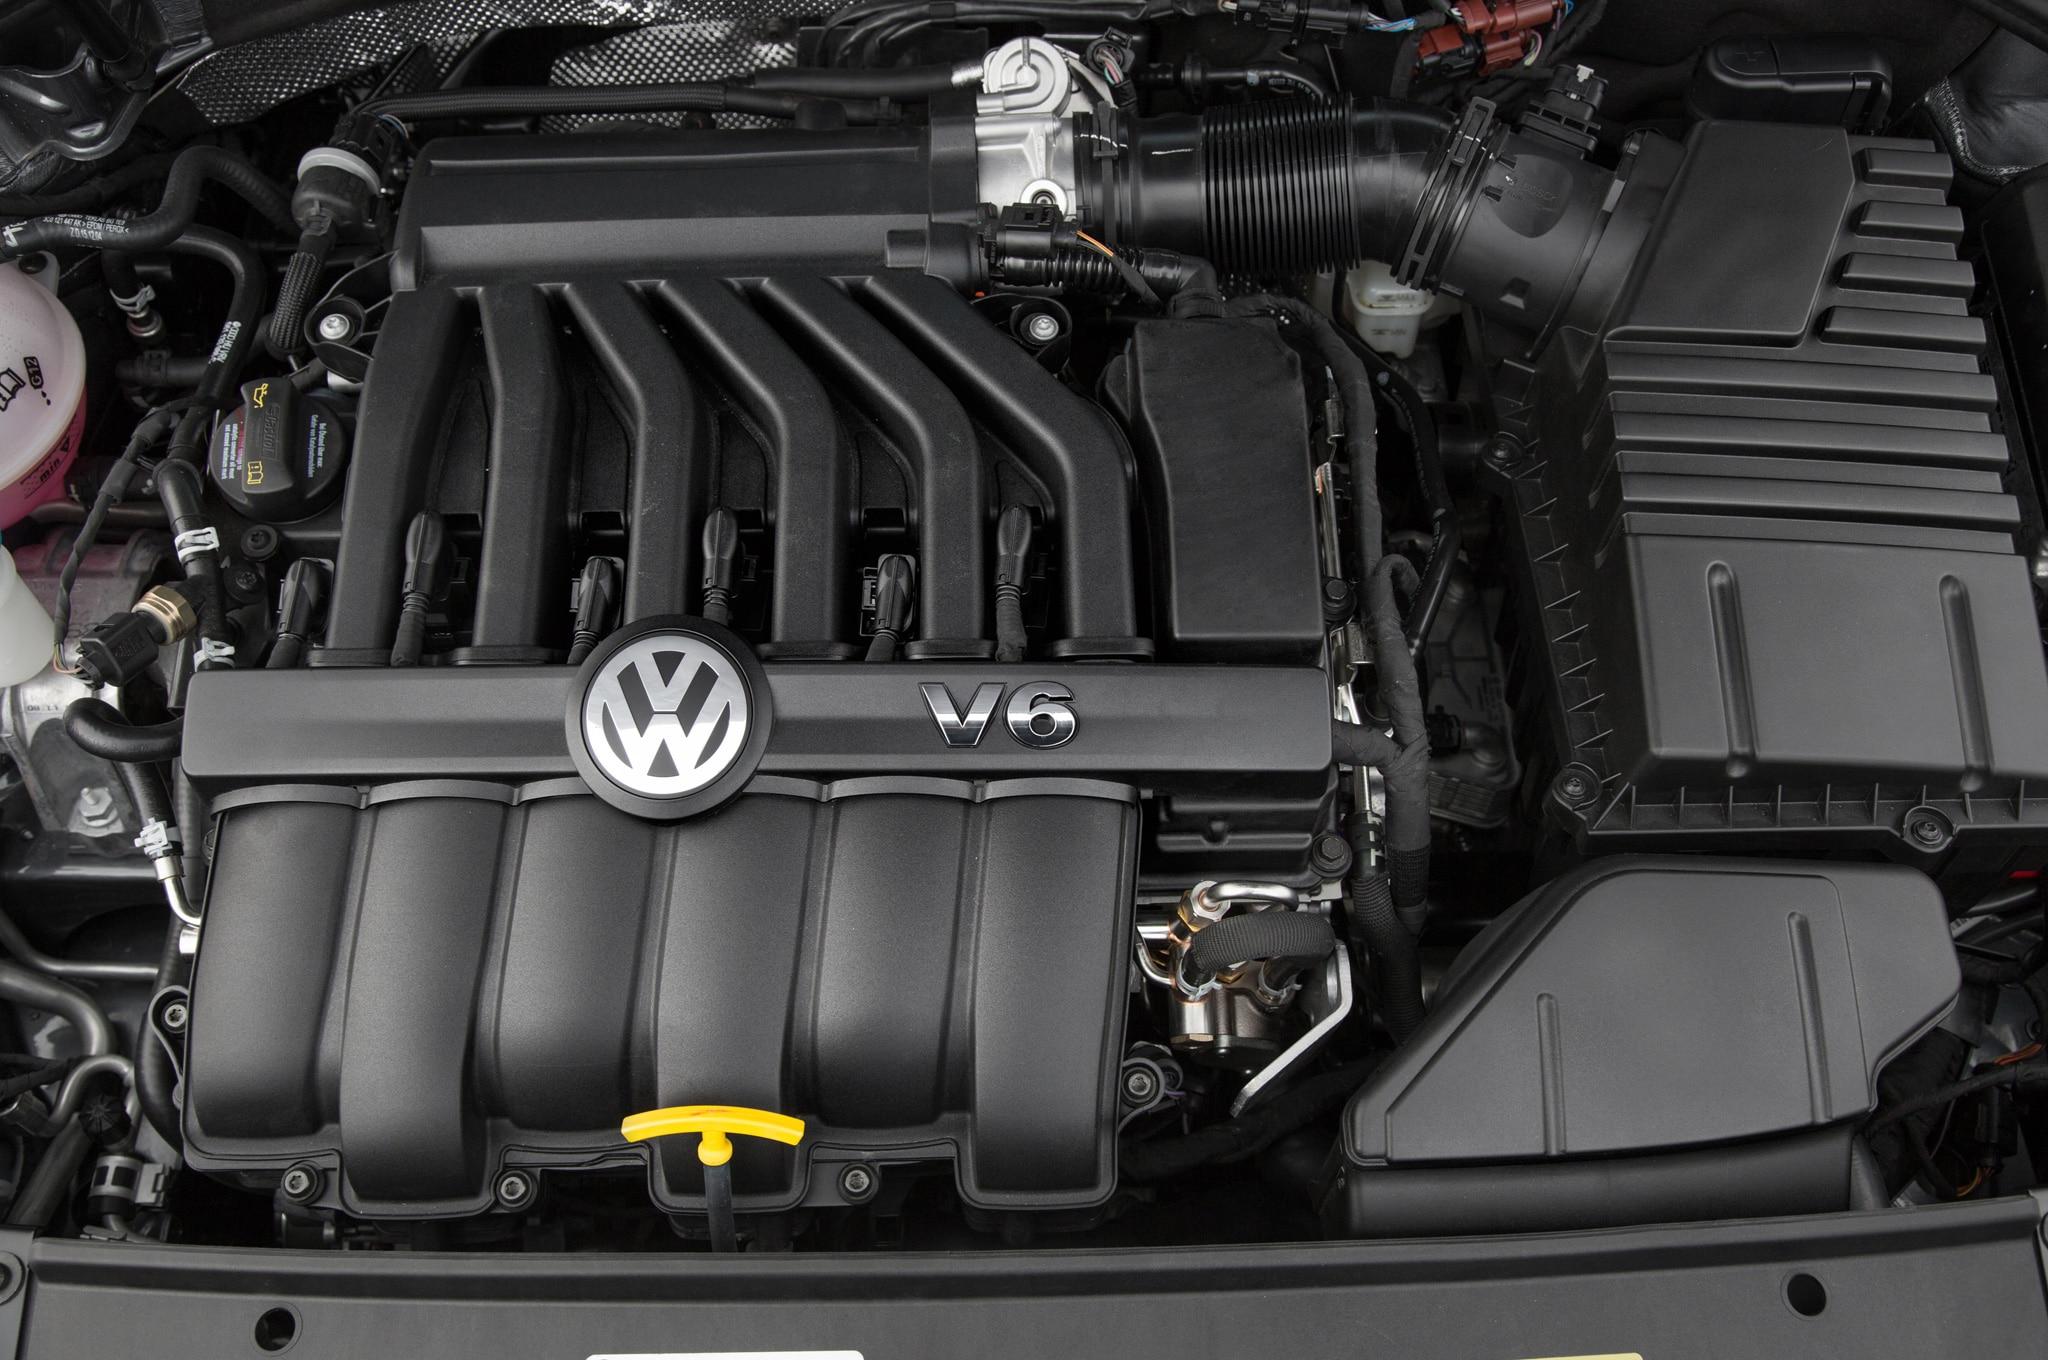 Hasil gambar untuk Volkswagen Passat engine 2017